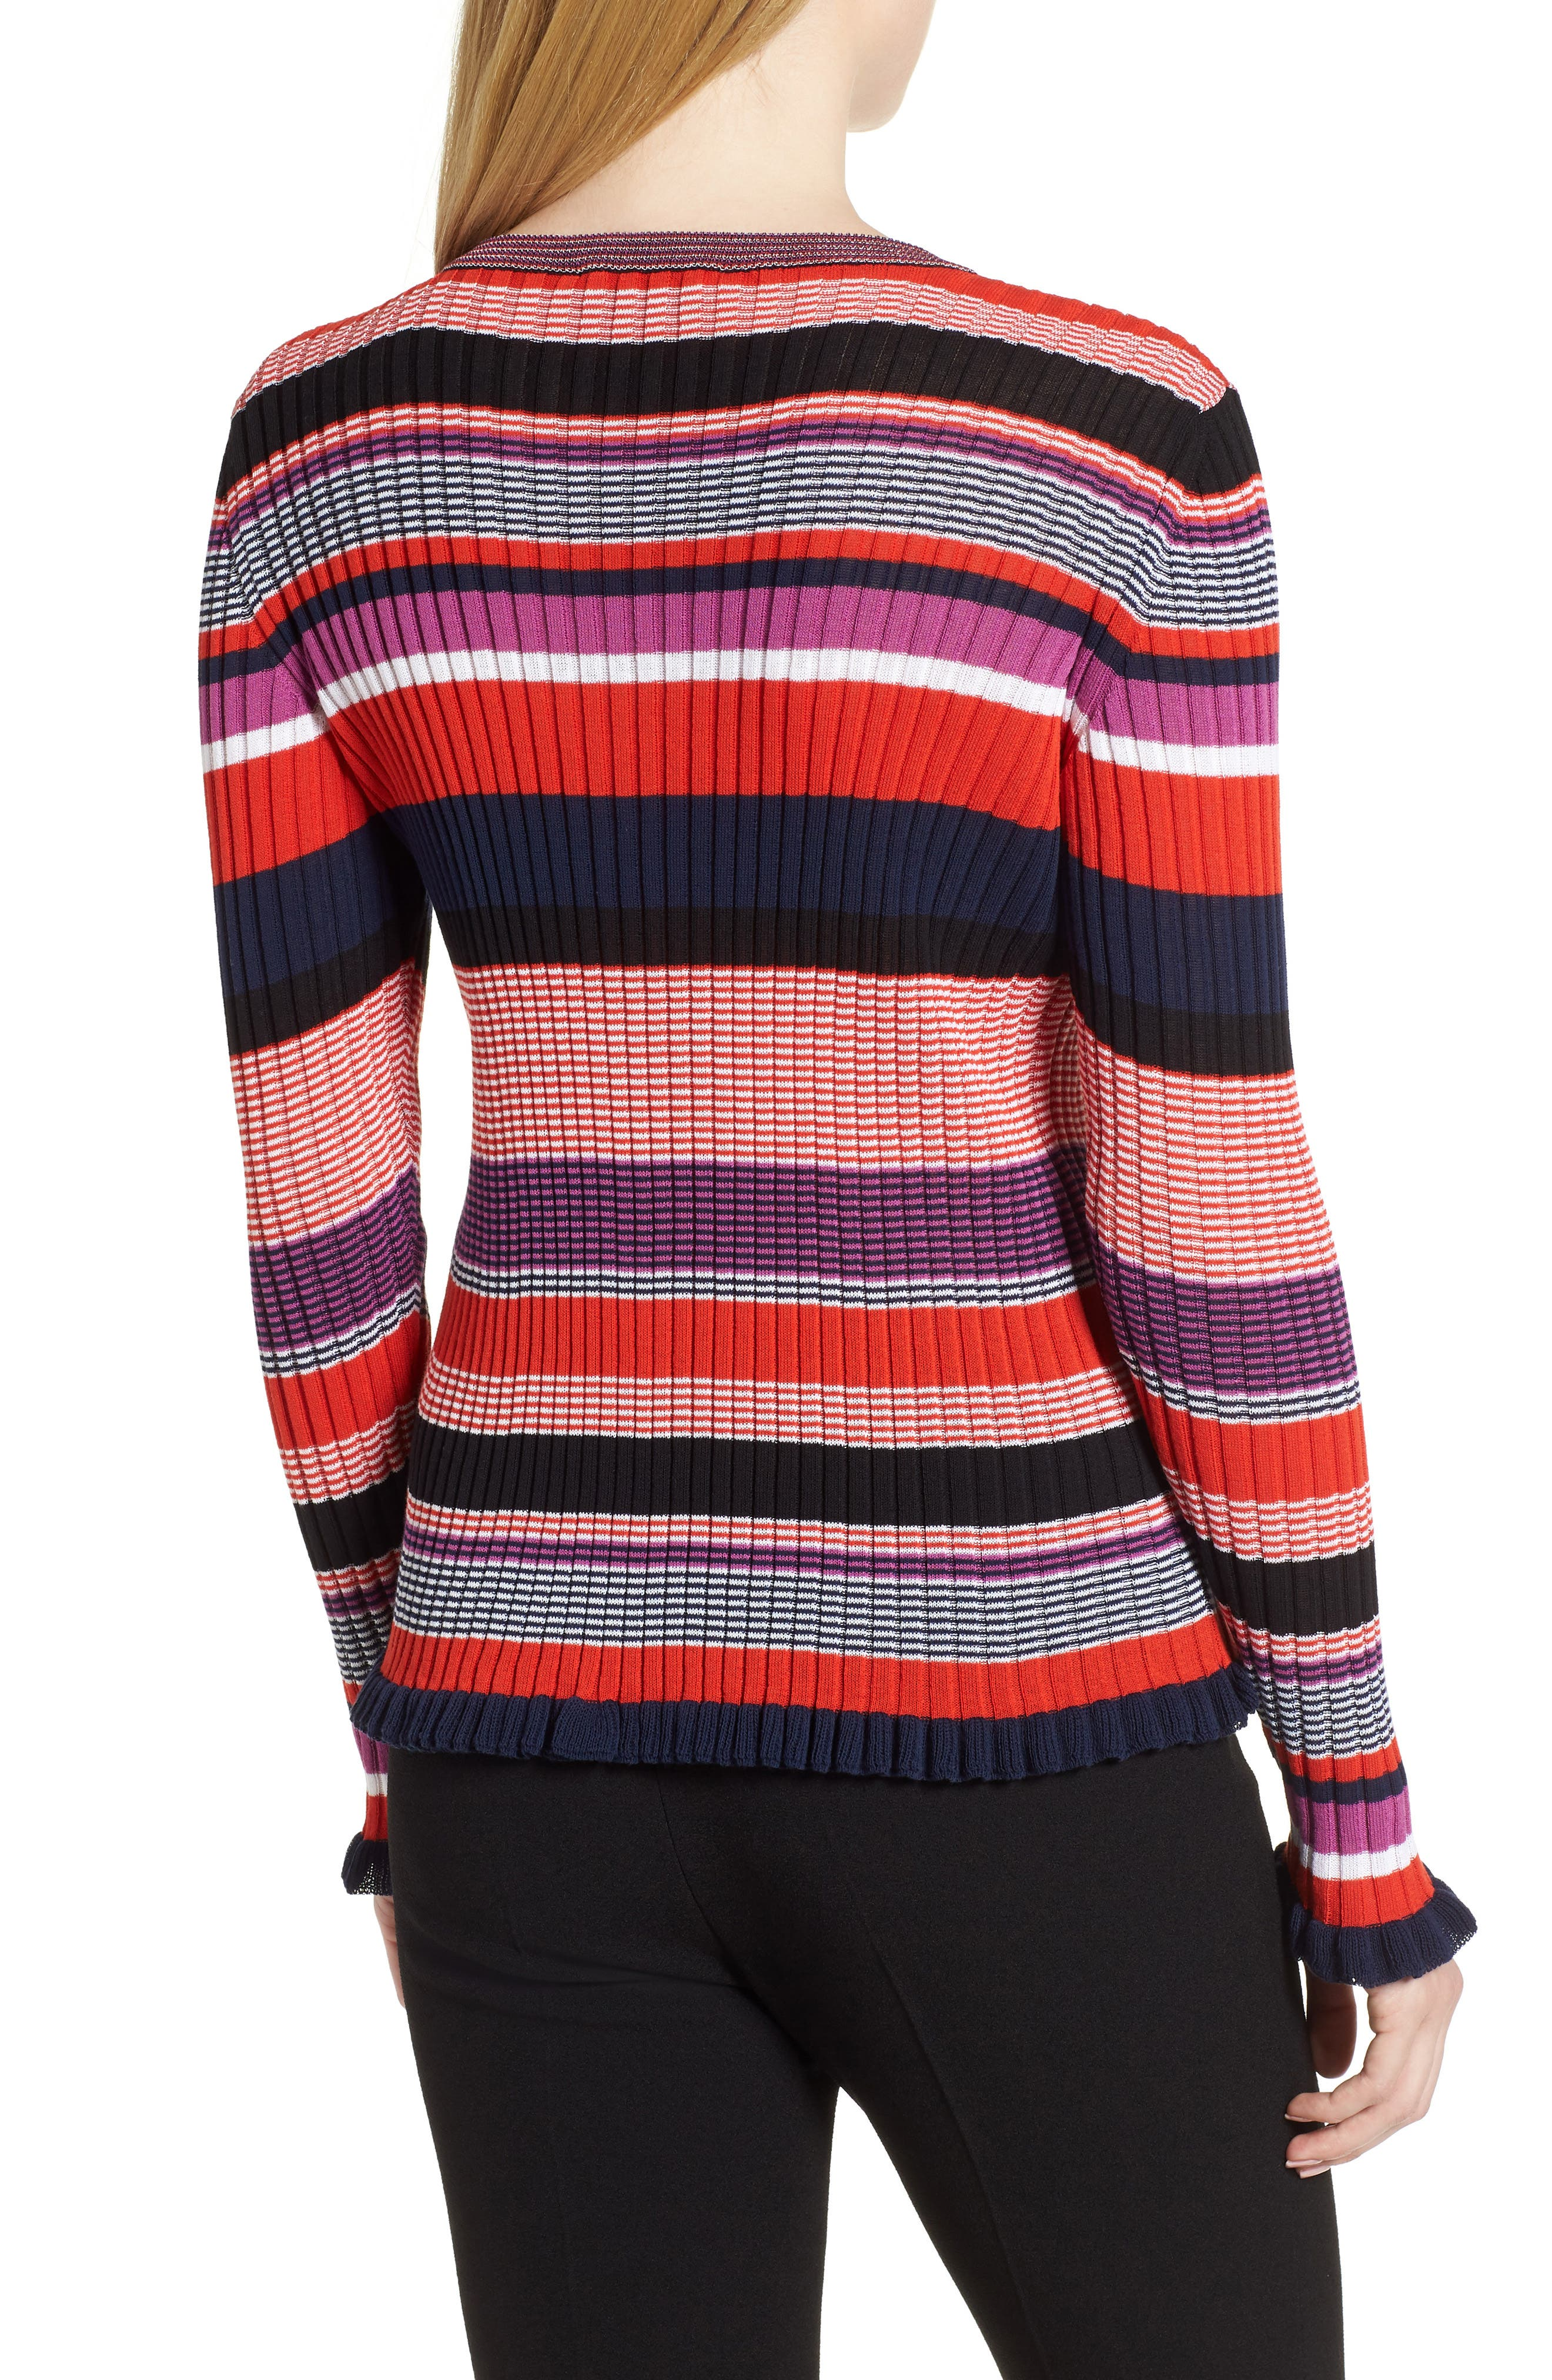 Fallegria Stripe Sweater,                             Alternate thumbnail 2, color,